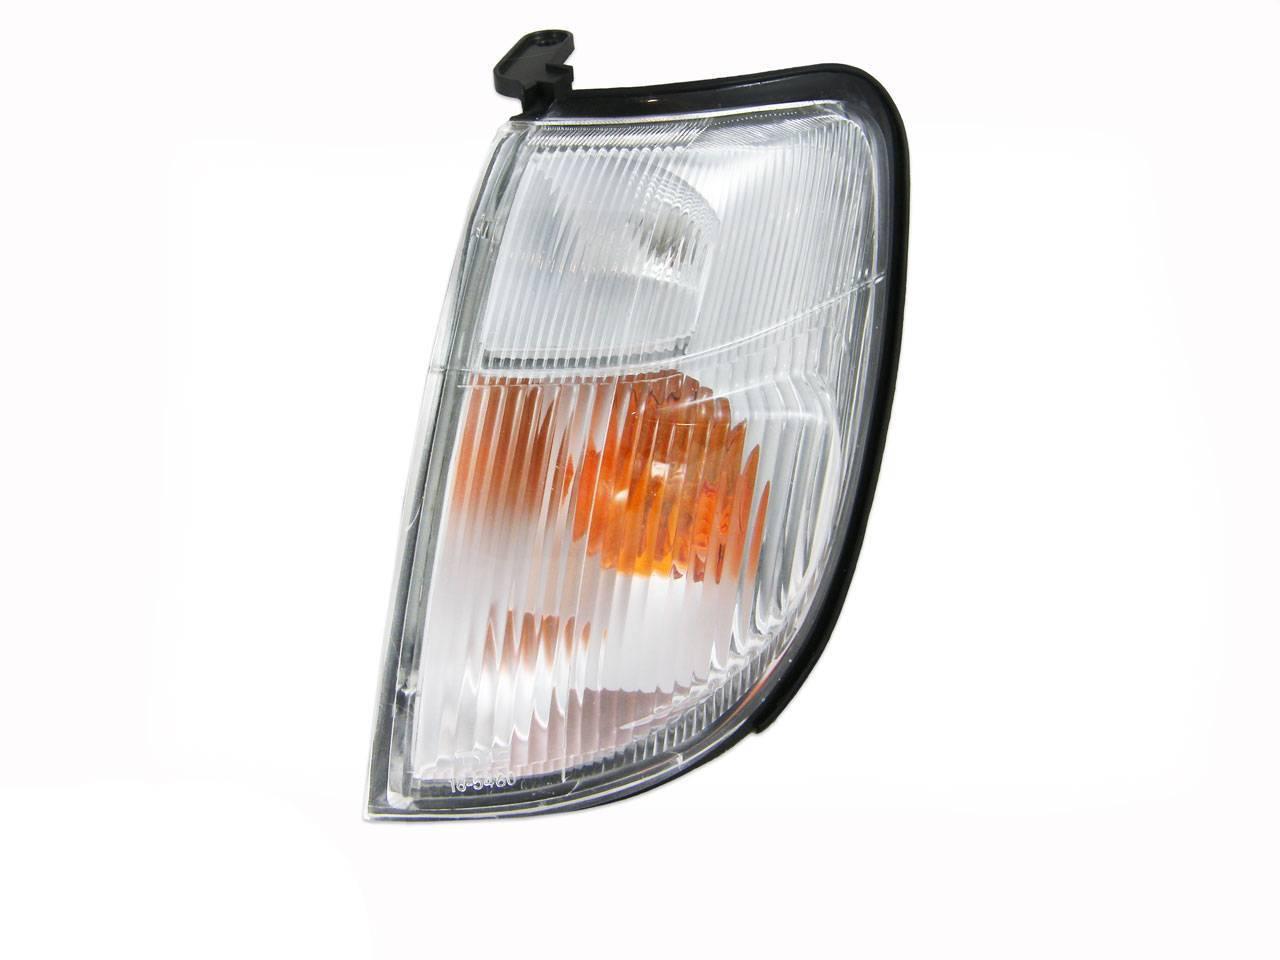 hight resolution of nissan navara d22 ute 99 01 lhs indicator corner light